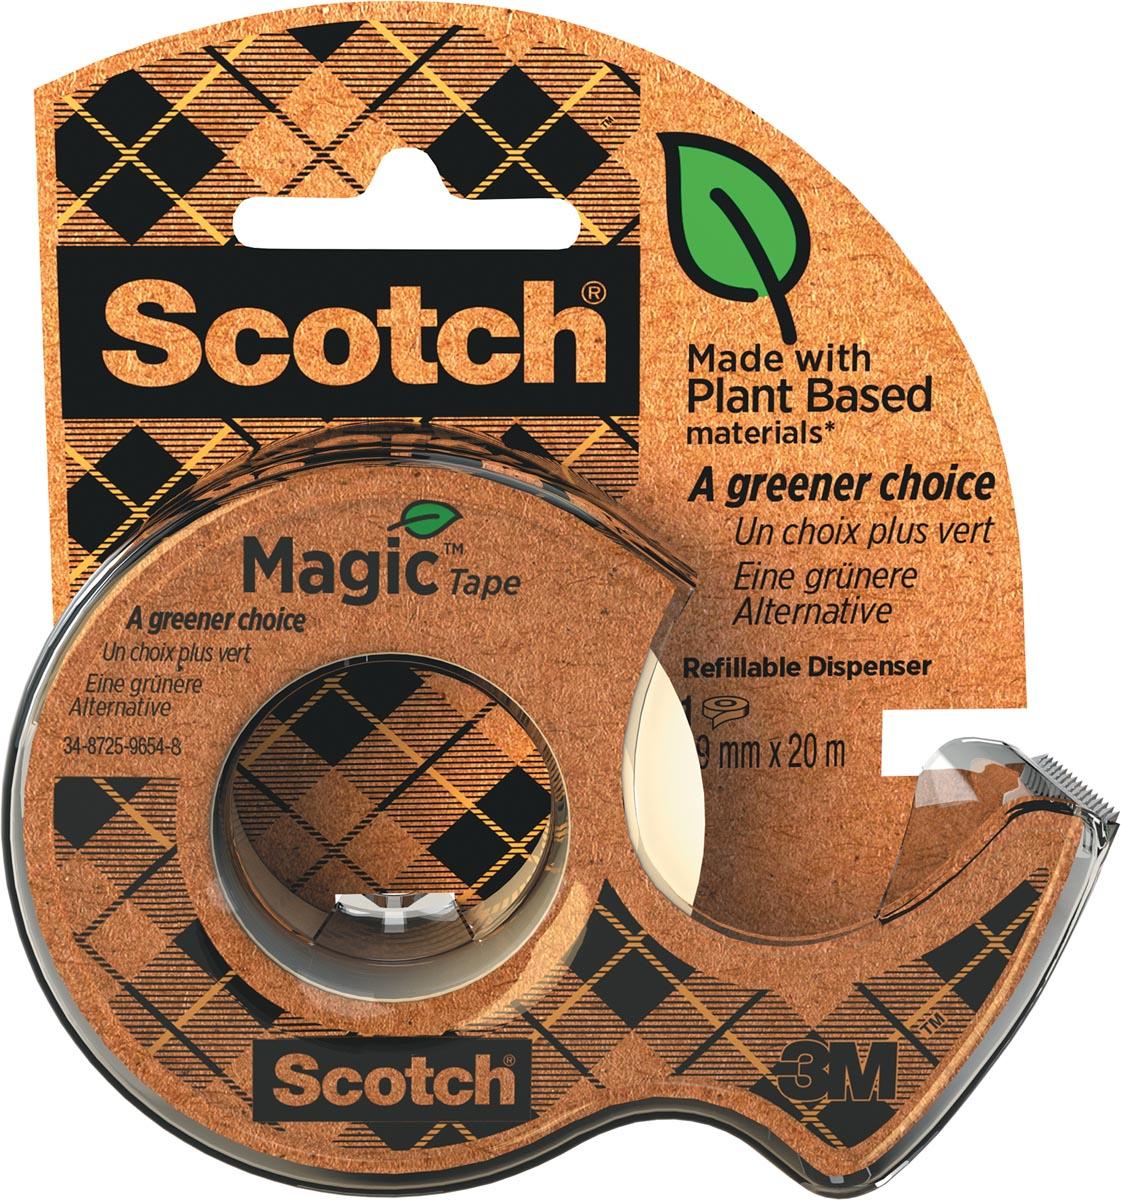 Plakband Magic Tape A greener choice, ft 19 mm, 20 m, op dispenser van 100 % gerecycleerd plastic